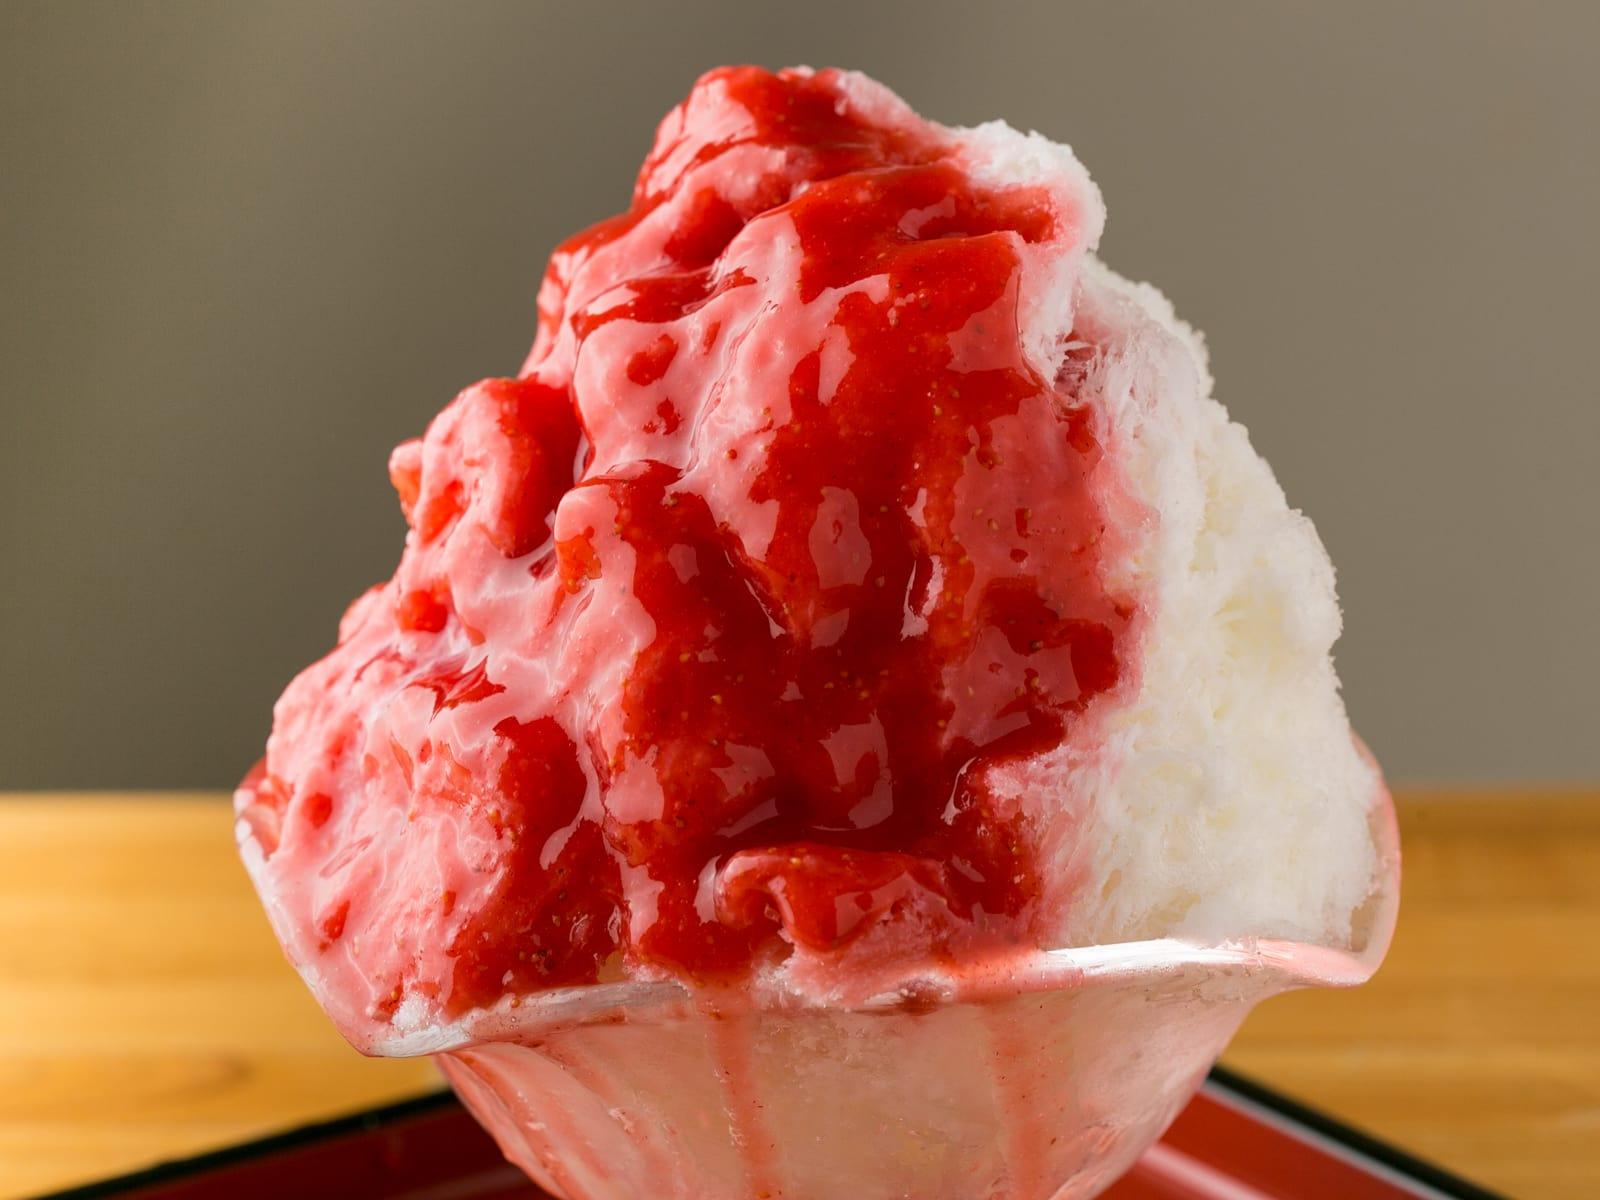 Himitsu's Strawberry Milk